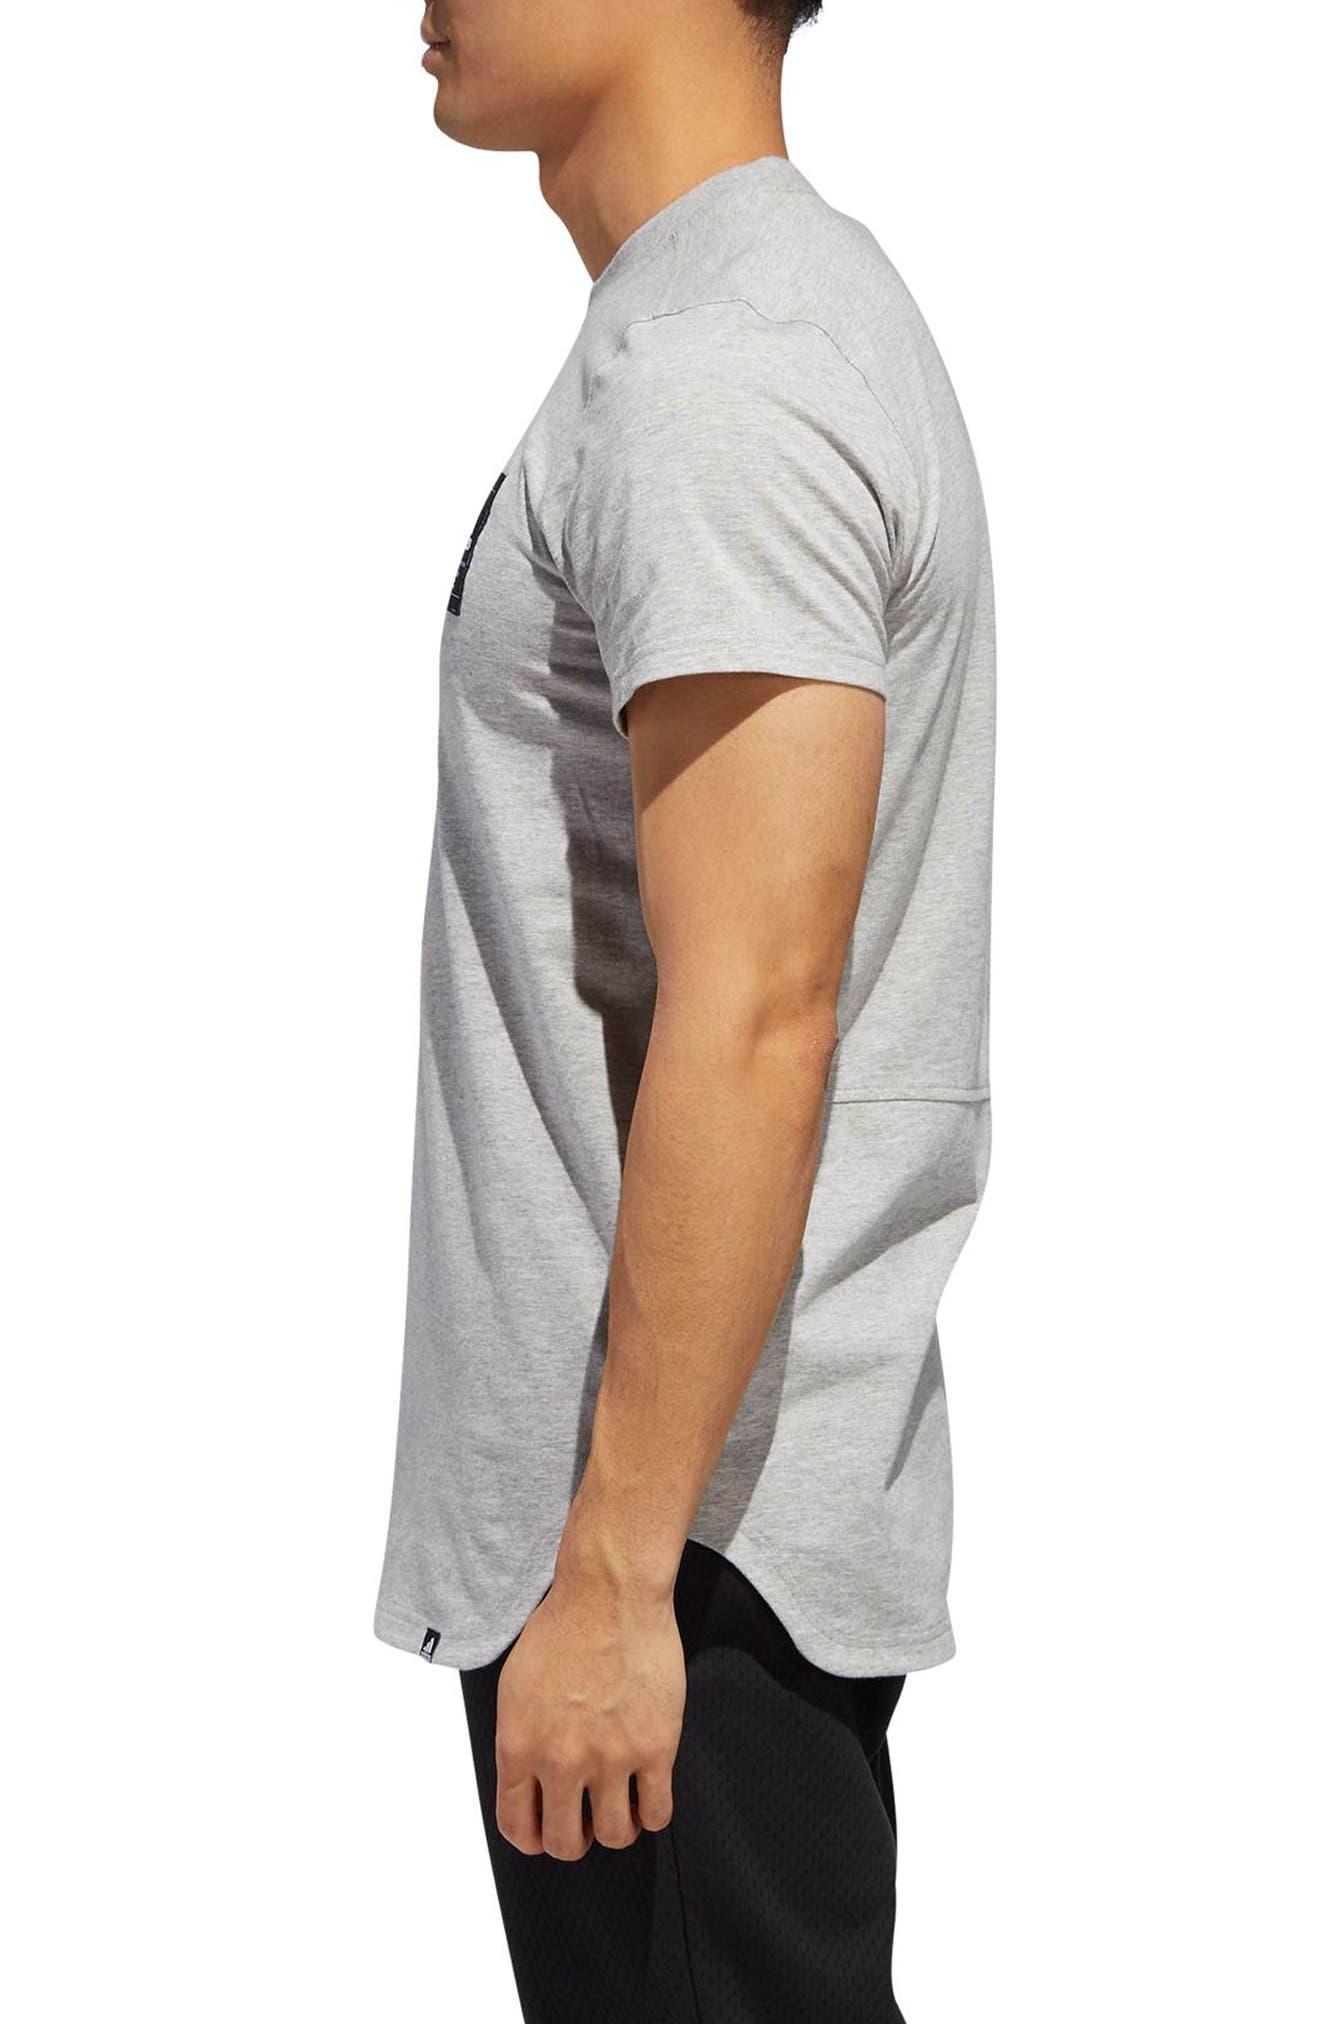 Scoop International T-Shirt,                             Alternate thumbnail 3, color,                             MEDIUM GREY HEATHER